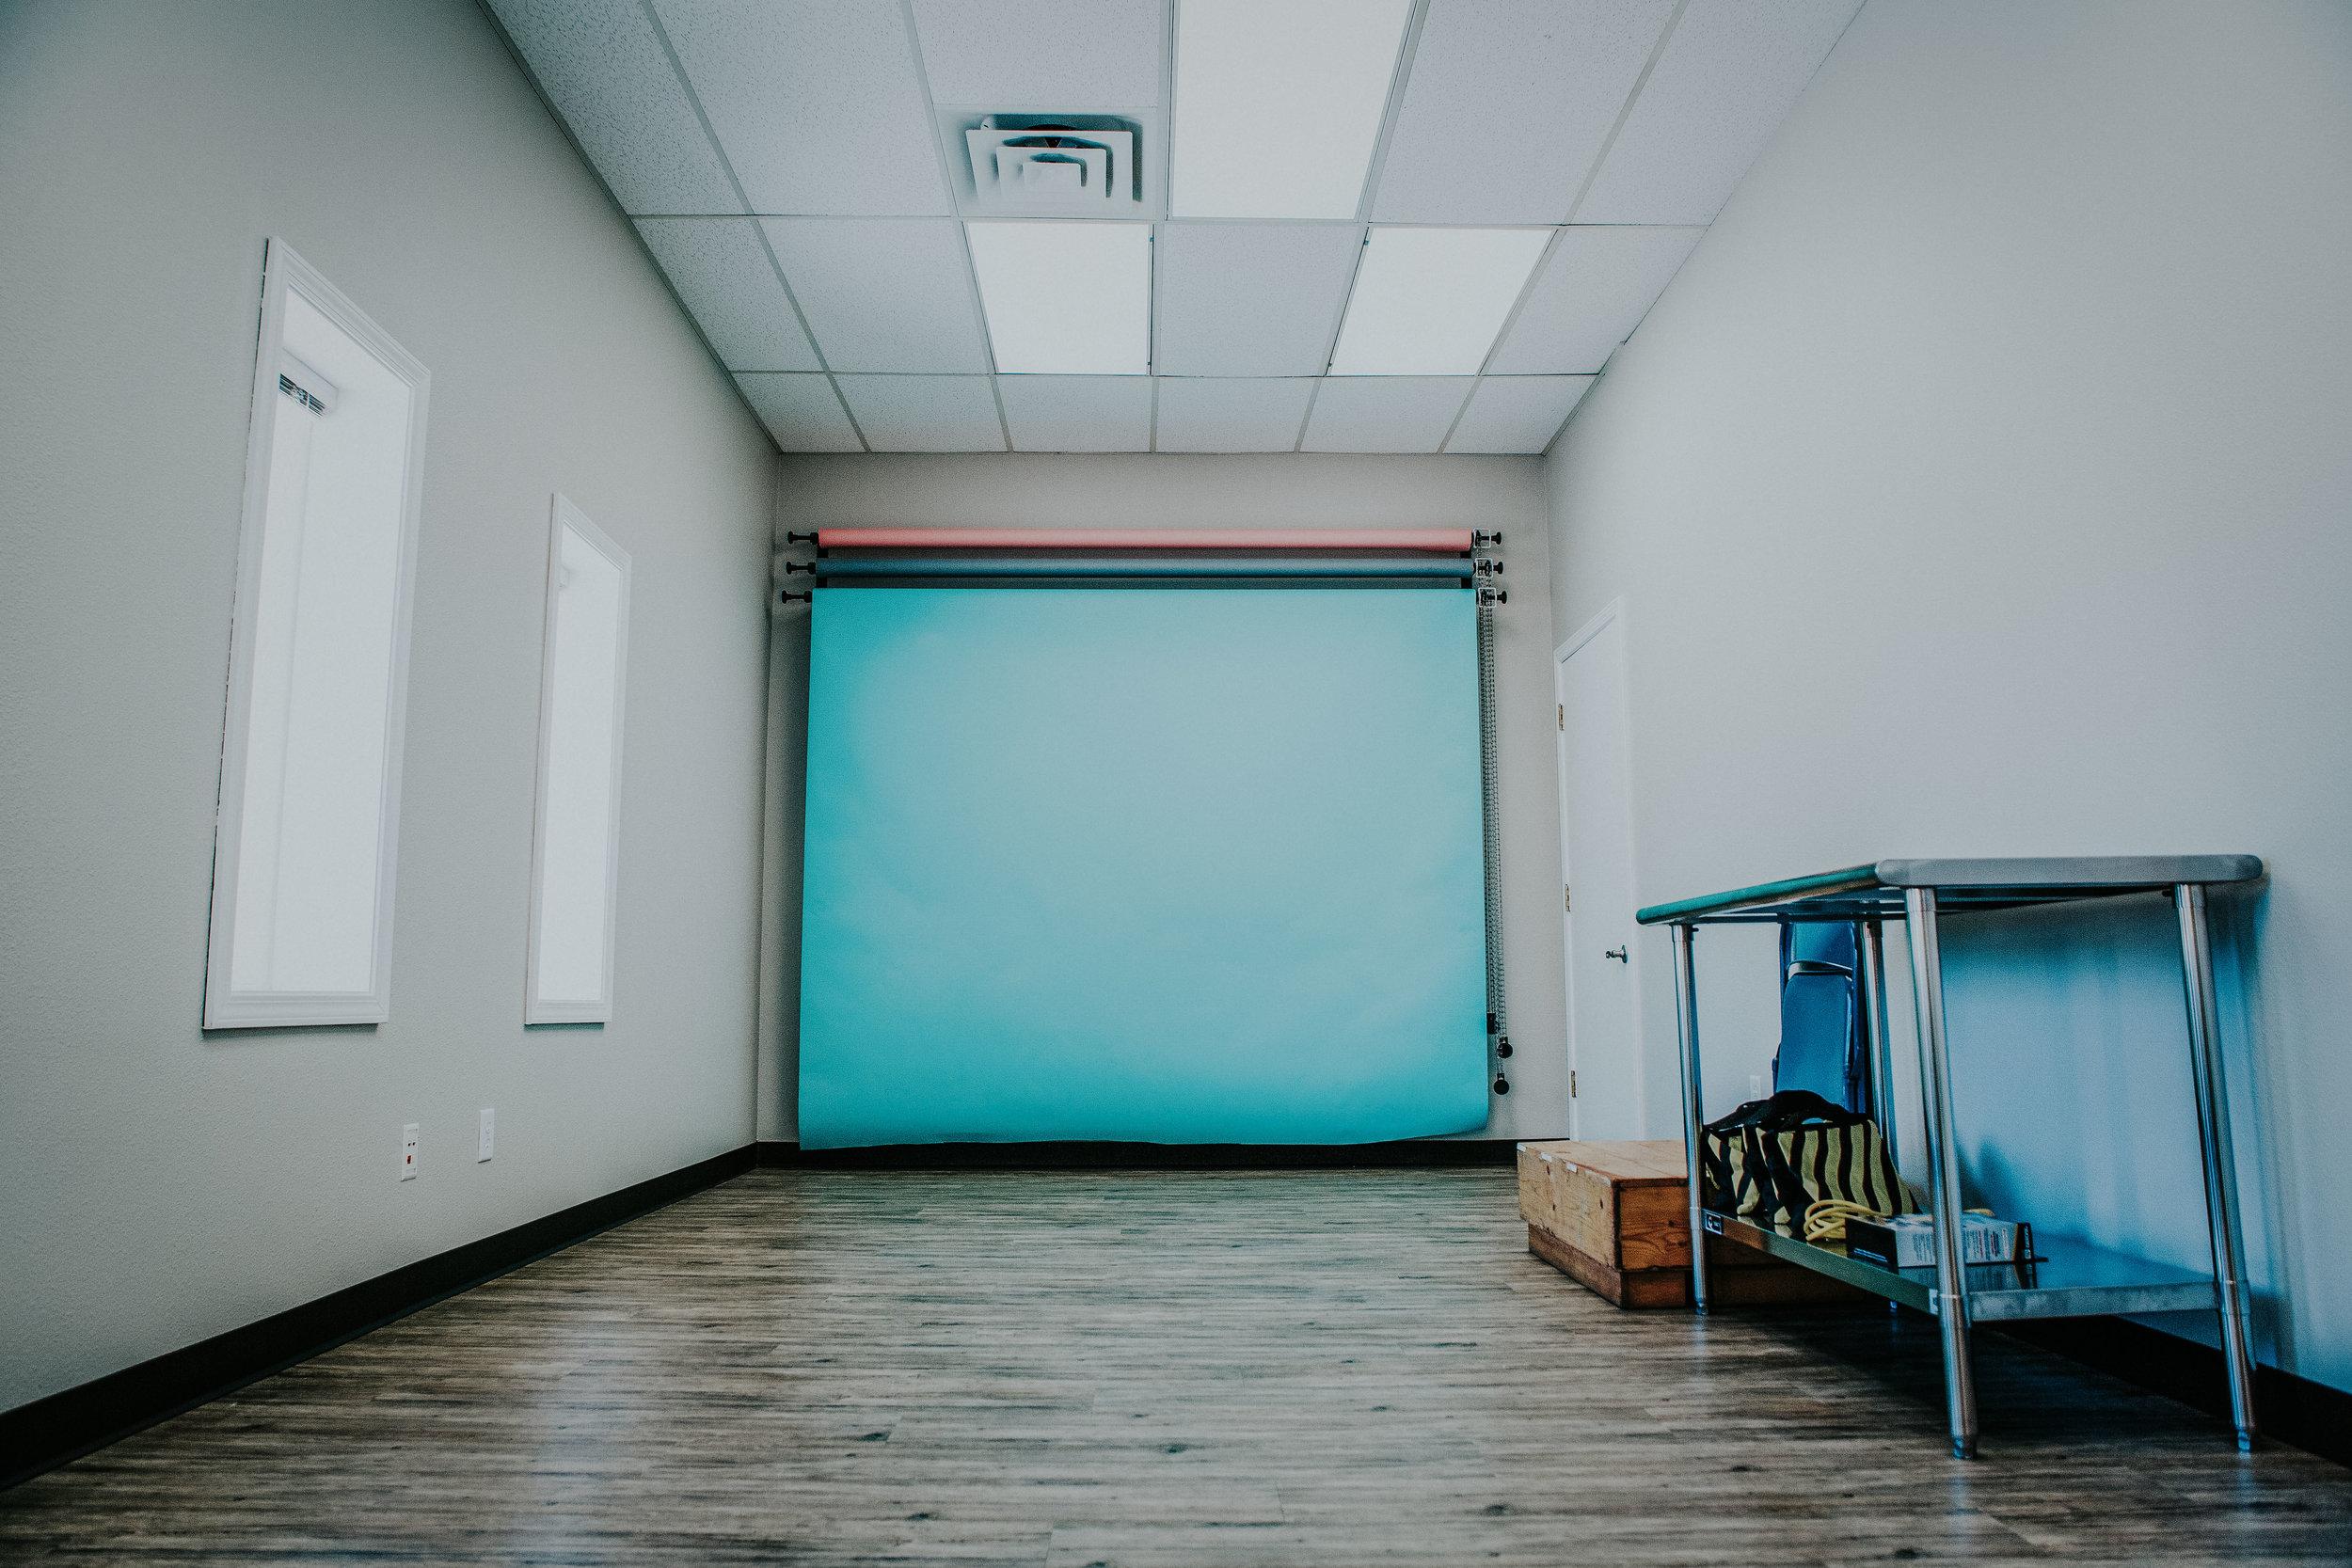 studio boise rental photography idaho-14.jpg